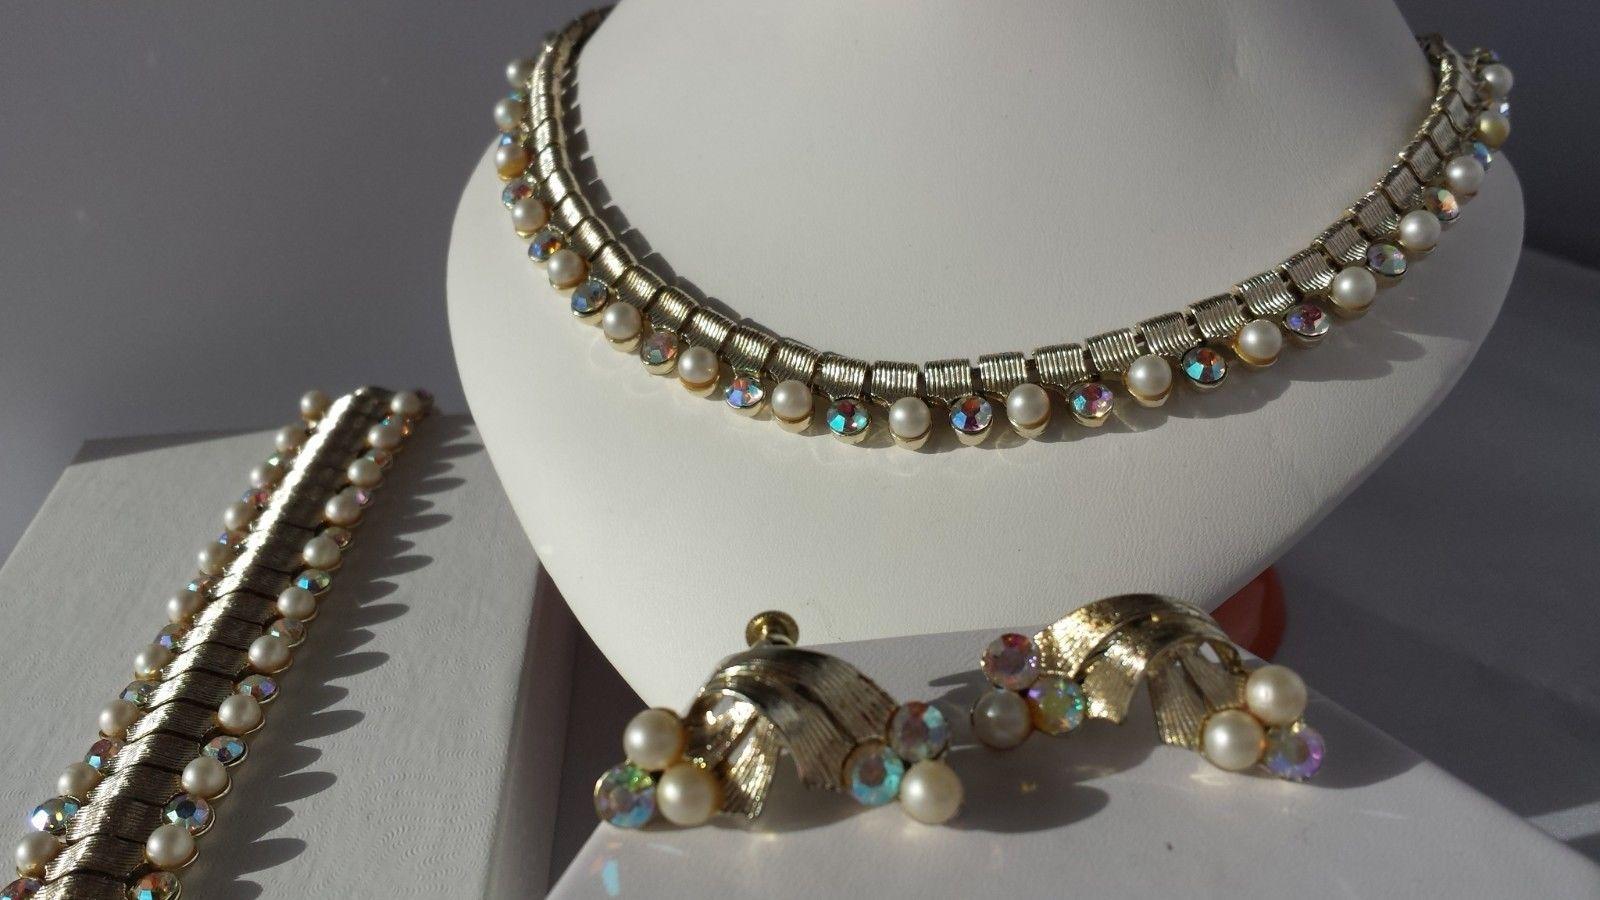 b6ab7fa5a 57. 57. Previous. Vintage Coro Gold Tone PARURE Necklace Earrings Set  Bracelet Rhinestone Pearl